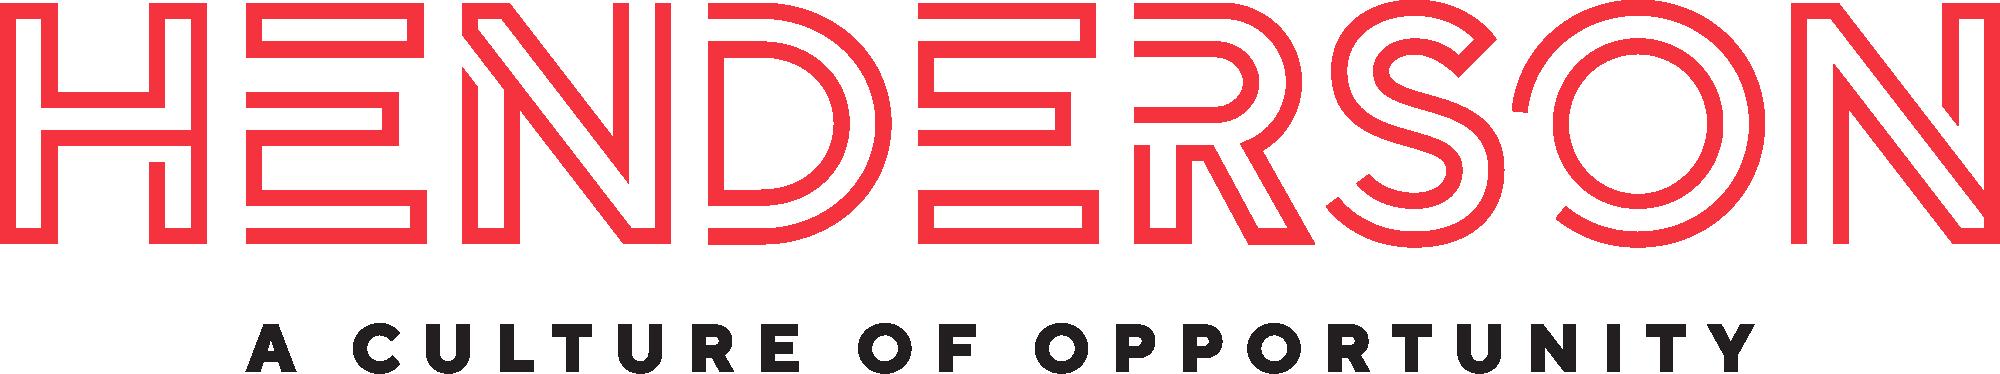 Henderson-Logo-tagline .png